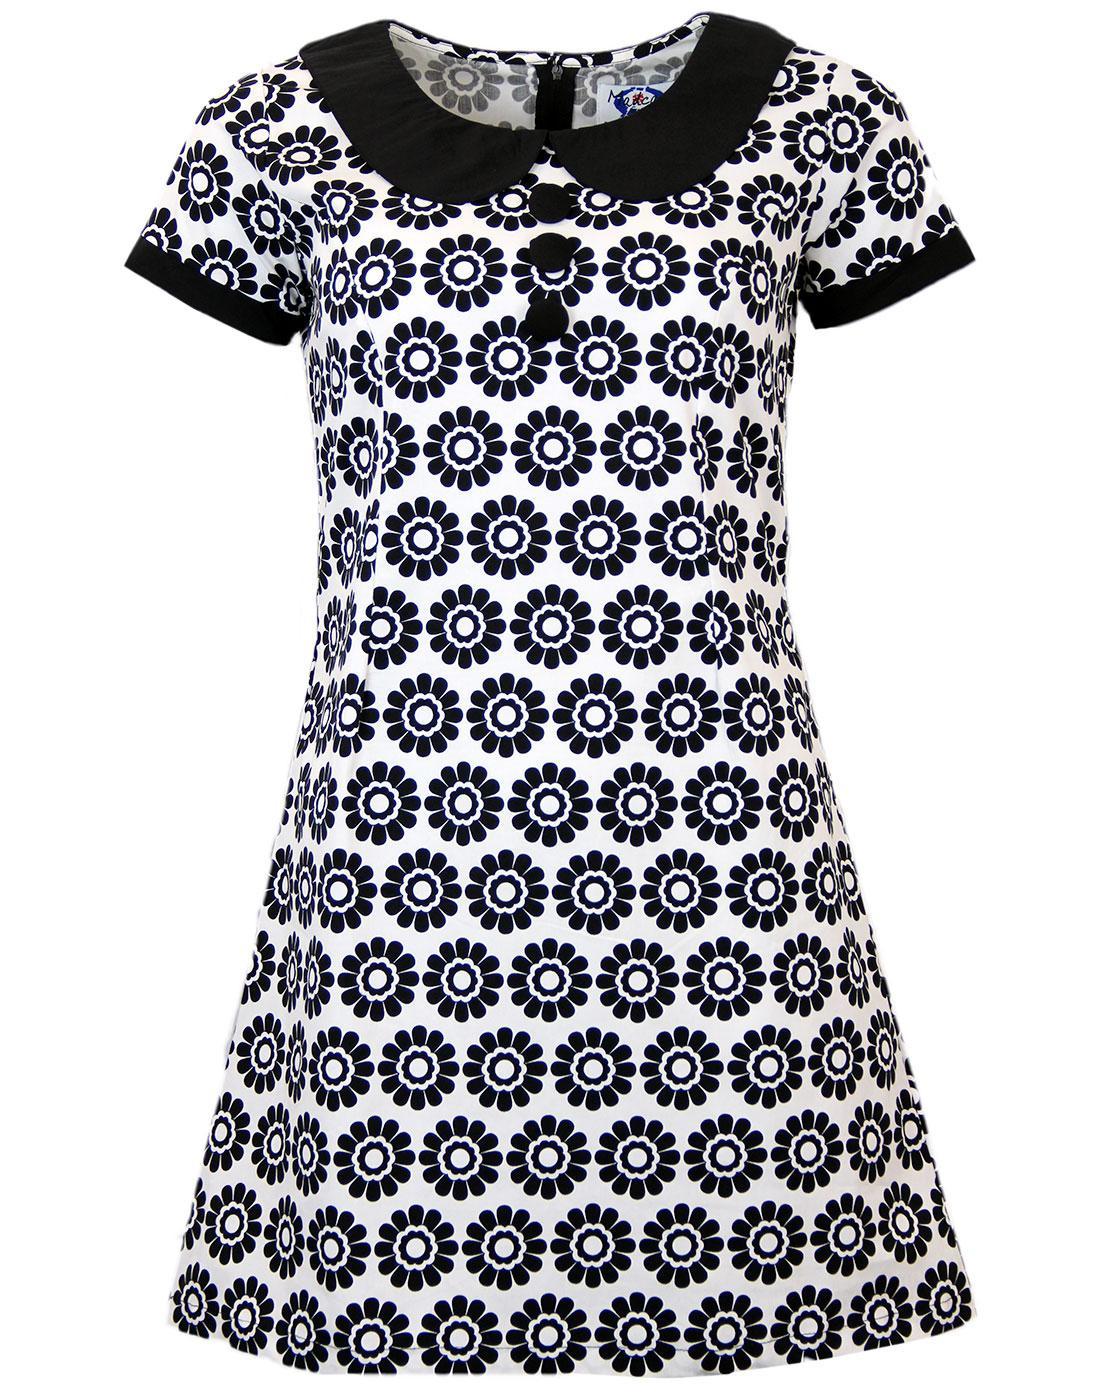 NEW RETRO SIXTIES INDIE MOD MINI DRESS 60s Vintage BLACK COLLAR DAISY MC146